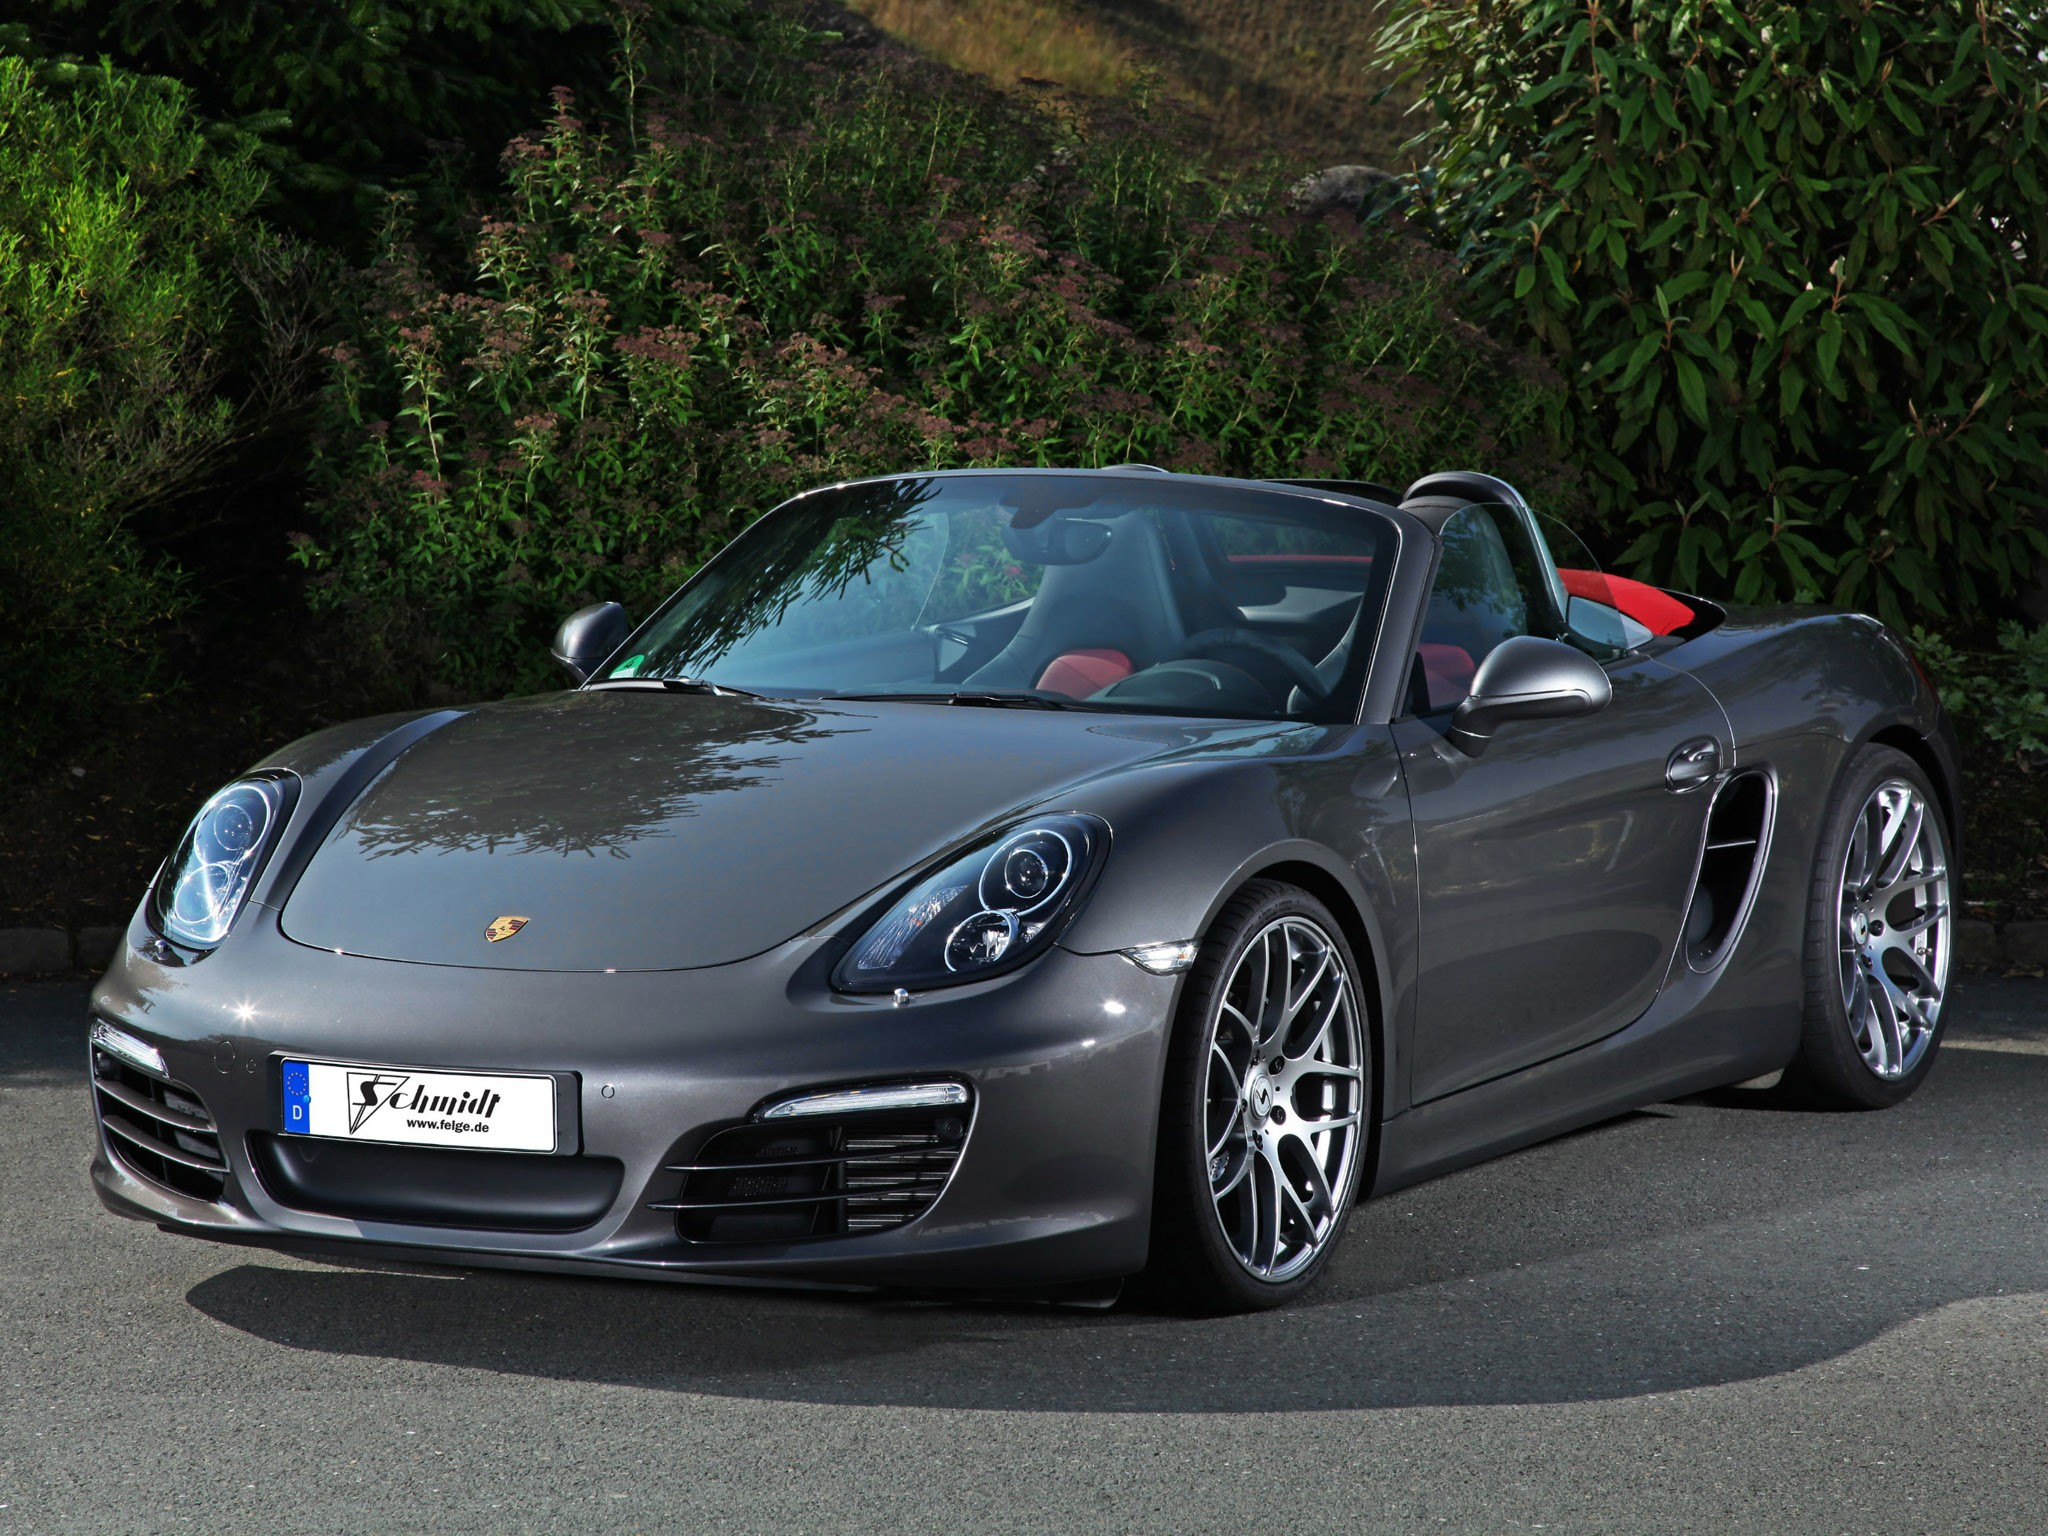 Porsche Boxster (2013) - Schmidt Revolution